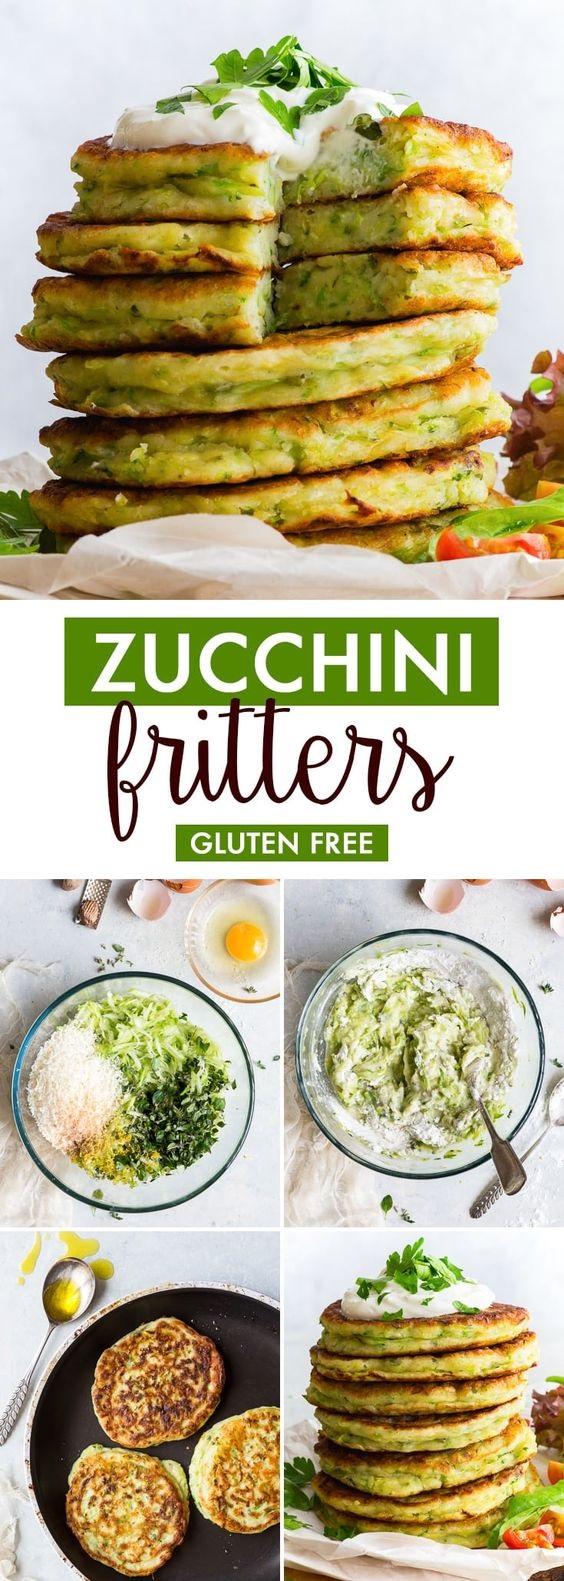 Zucchini Fritters (Gluten Free, Dairy Free Option)